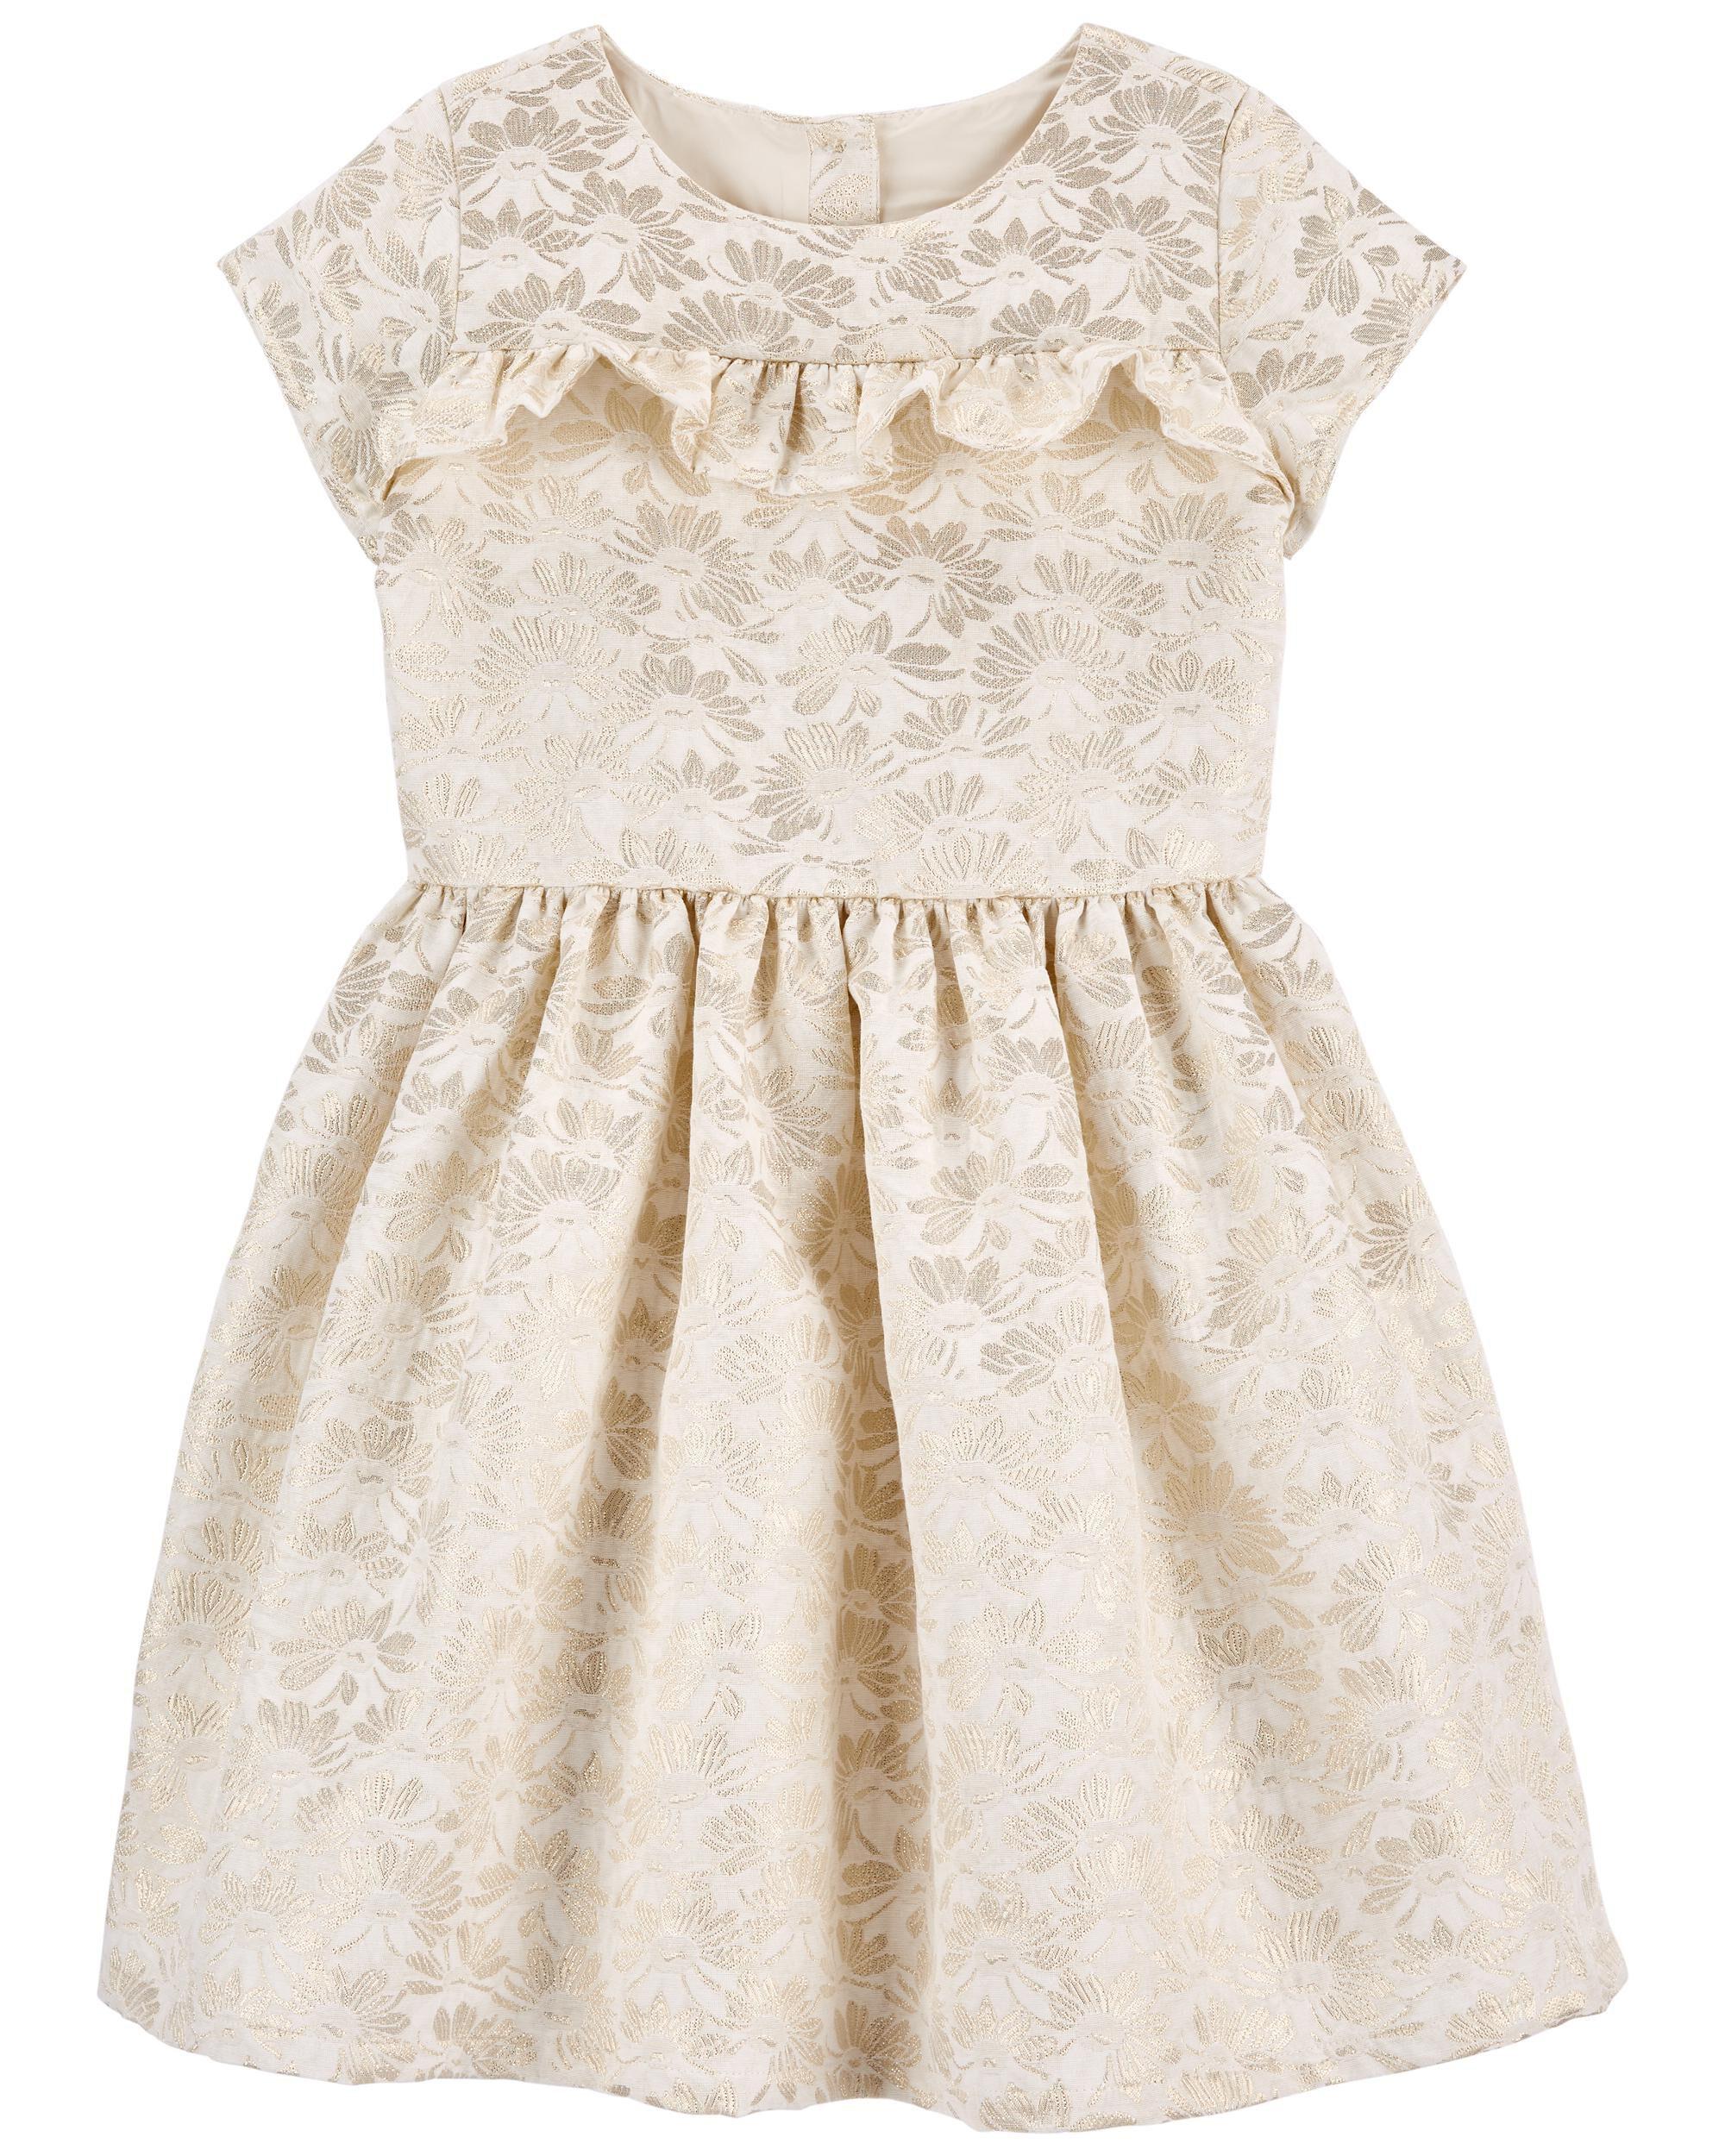 *CLEARANCE* Jacquard Woven Dress